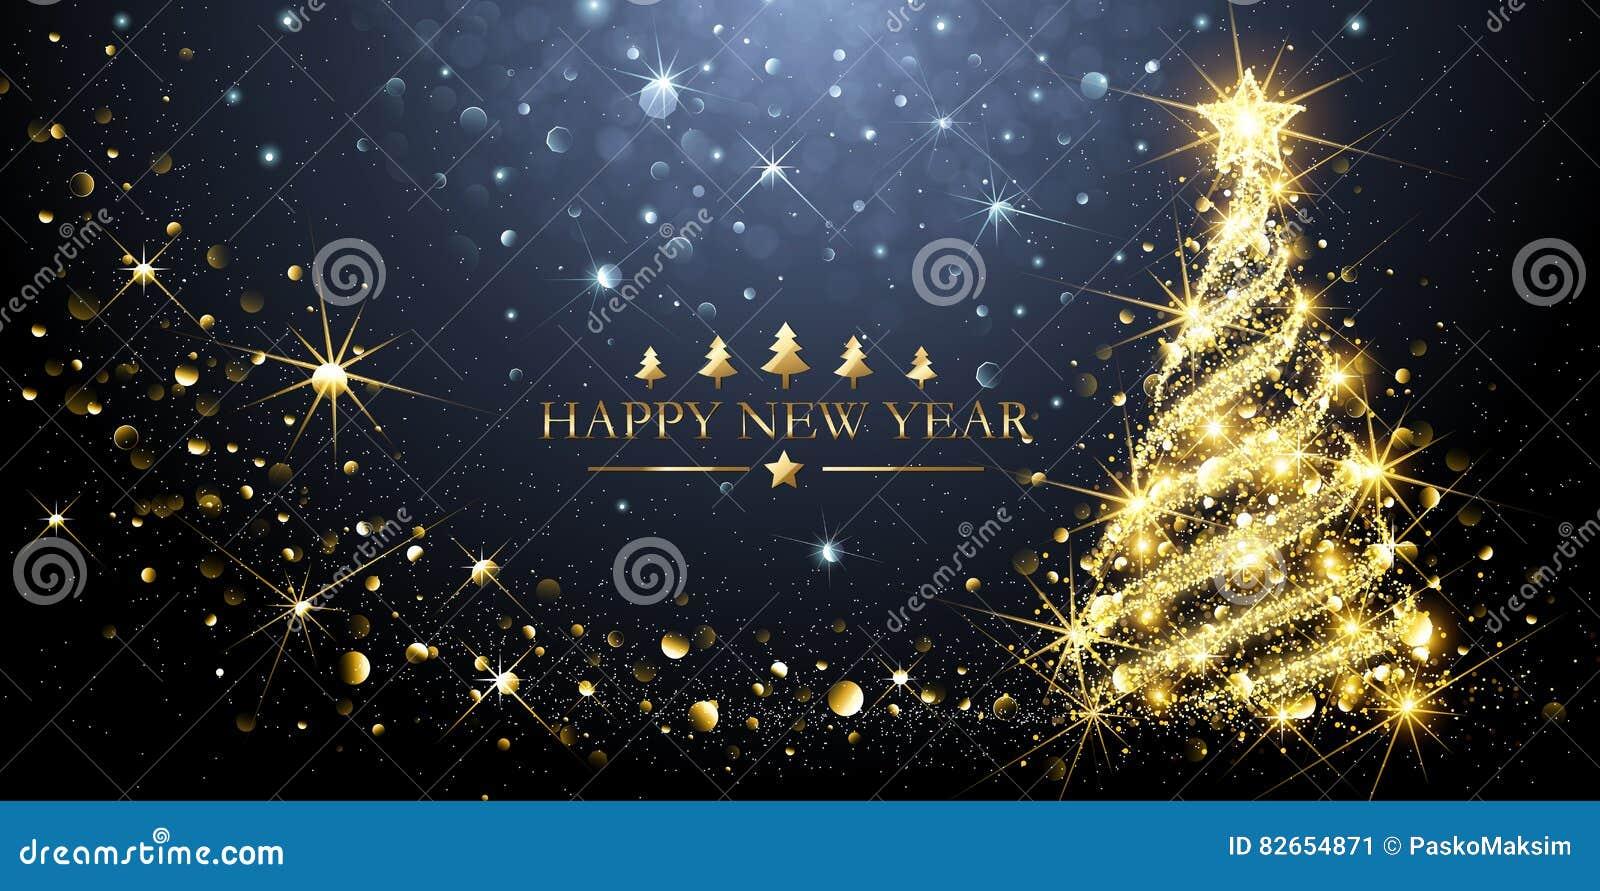 Greeting Card Golden Christmas Tree Vector Stock Vector